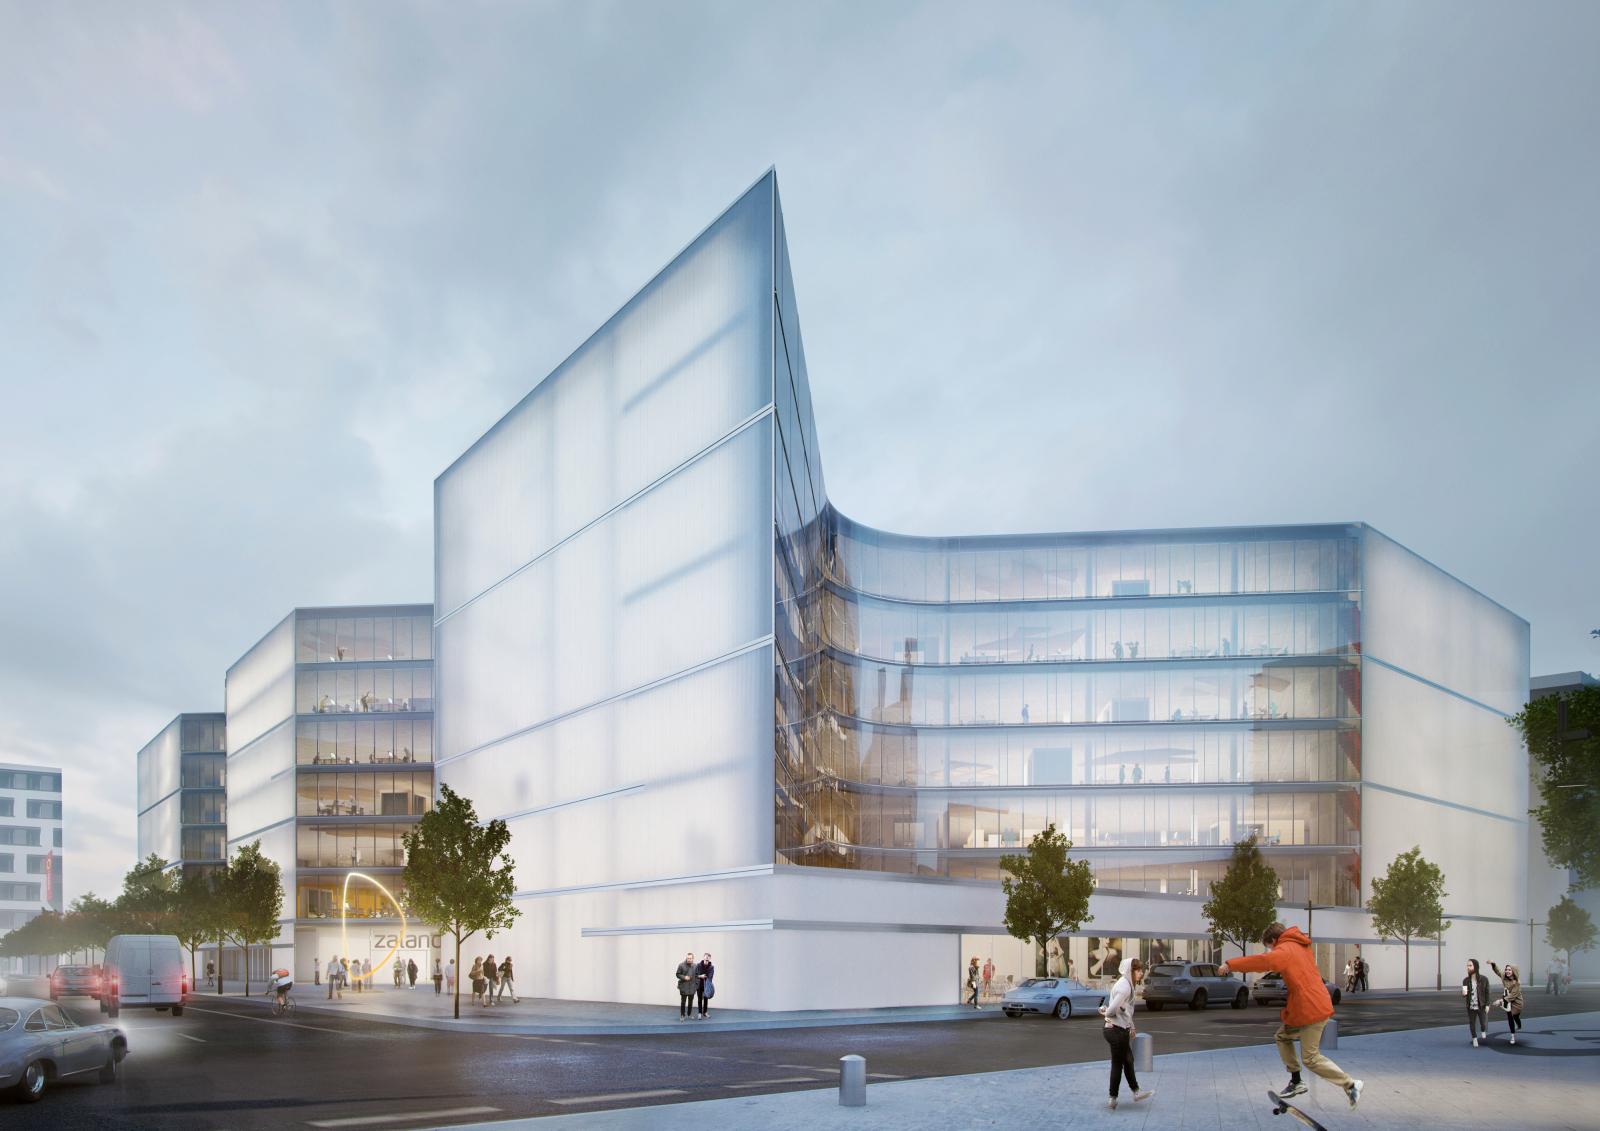 Zalando to open its office campus in the Berlin district Friedrichshain/ Kreuzberg in 2018